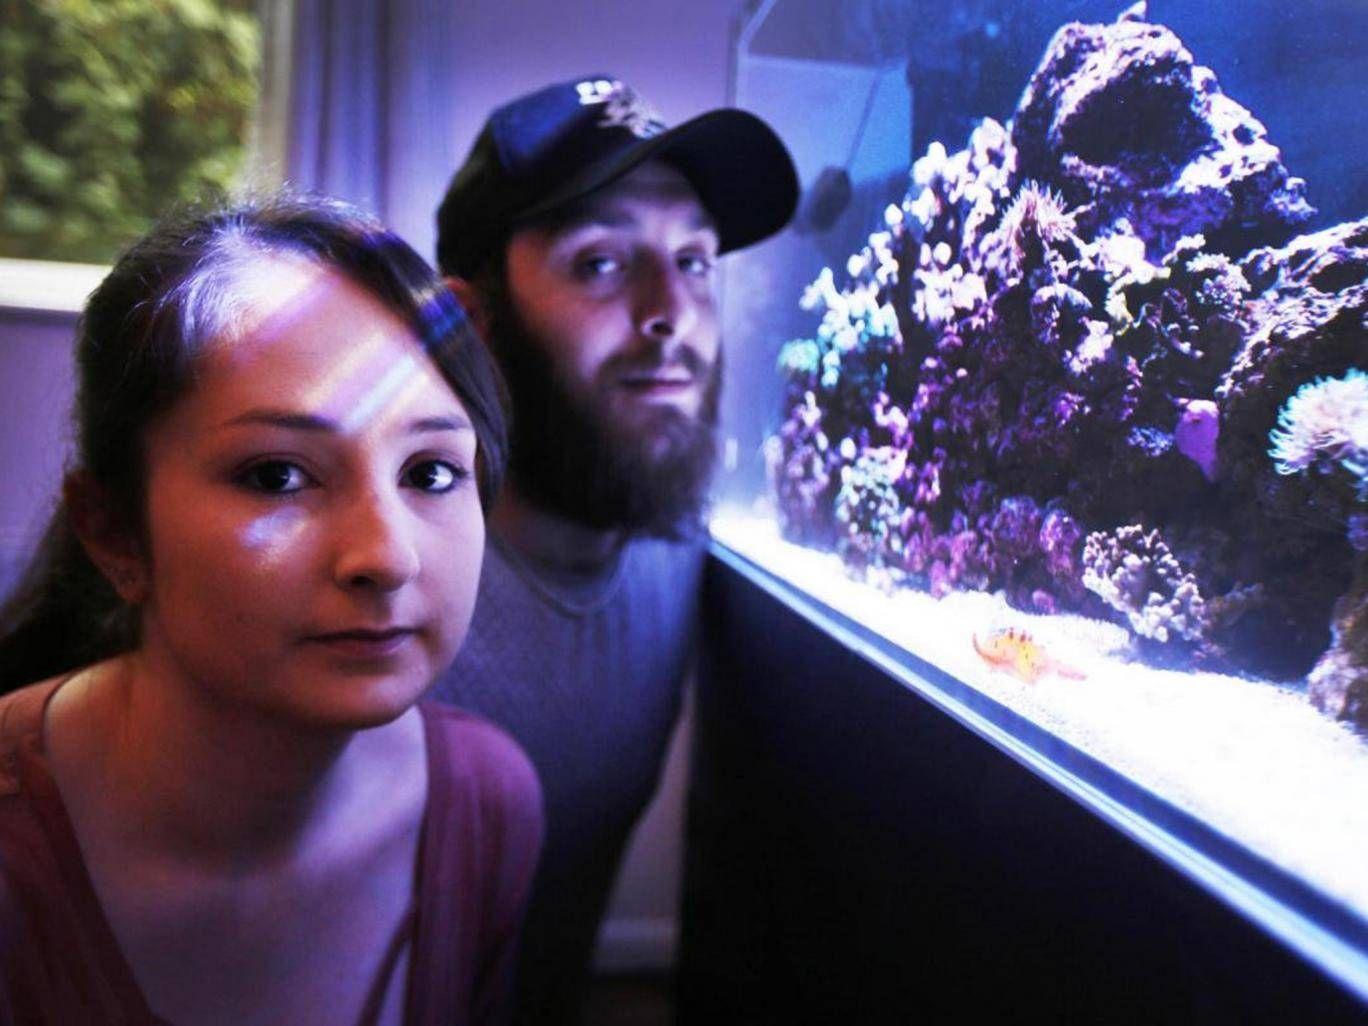 Chris Matthews and his girlfriend beside a fish tank